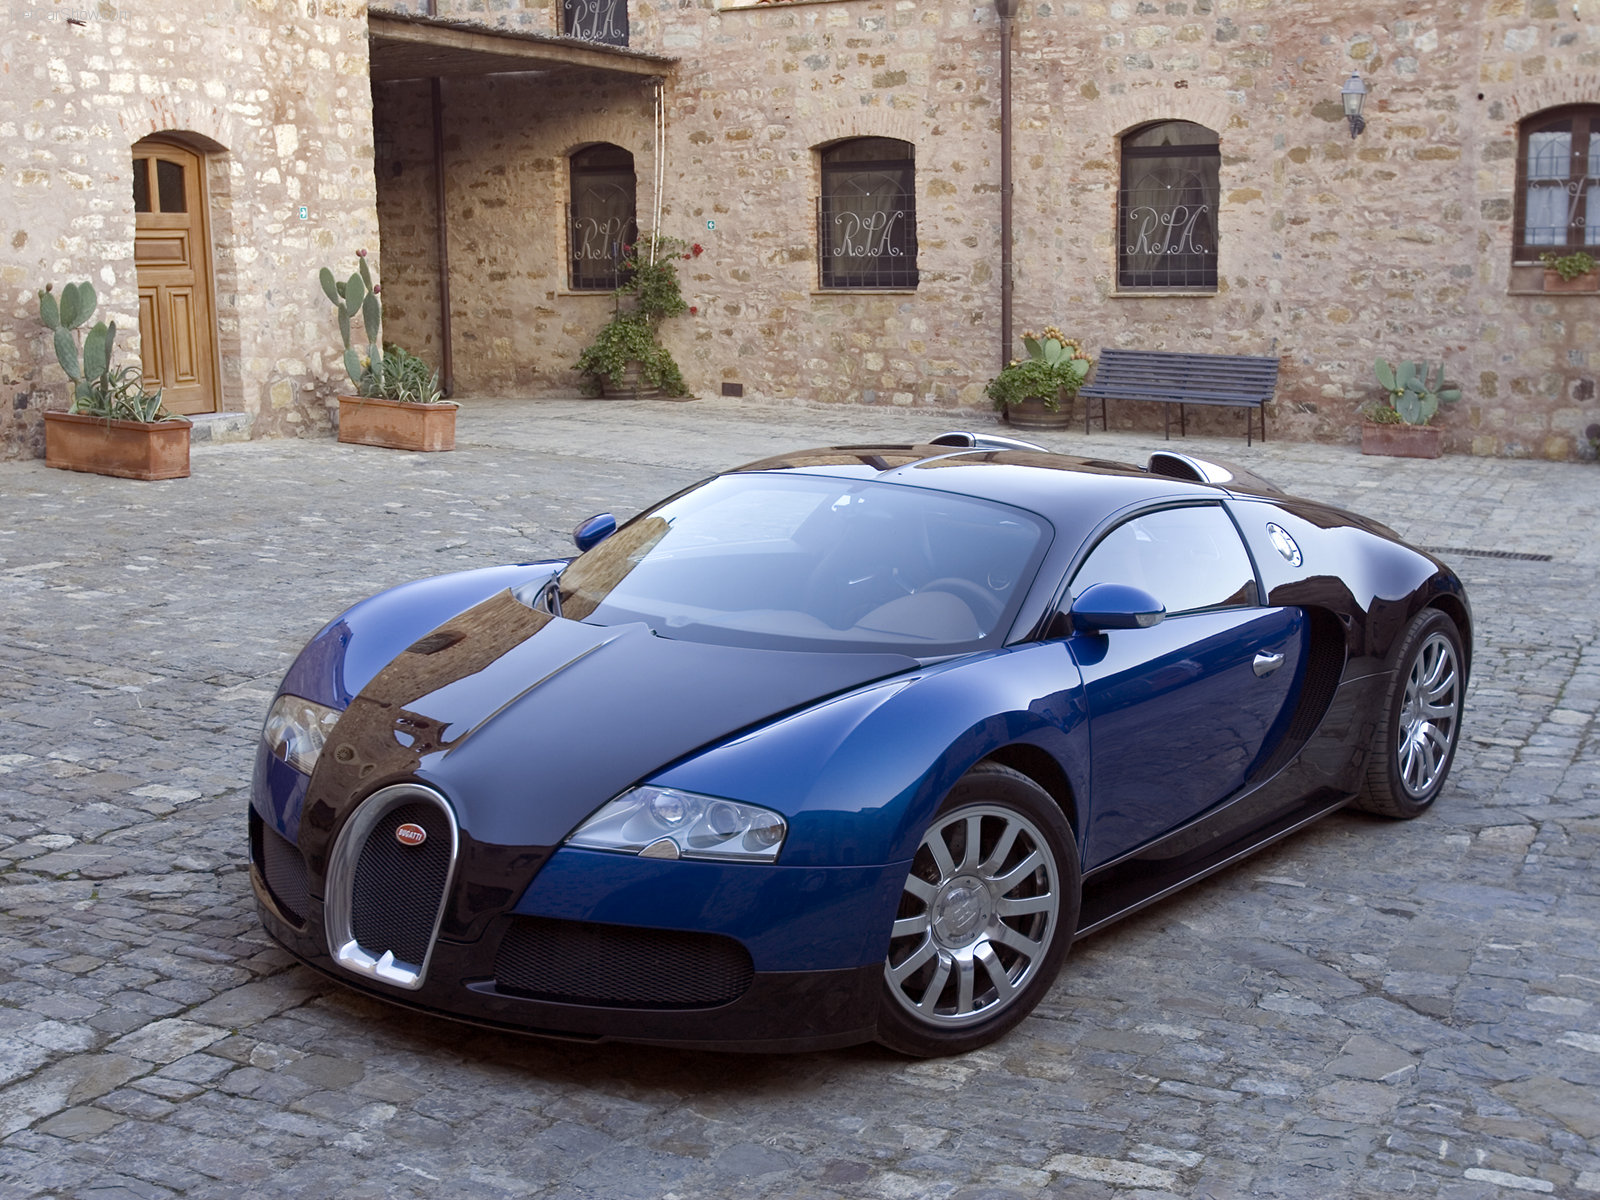 stunning-Bugatti-Veyron-wallpaper-8 Inspiring Bugatti Veyron Quarter Mile Speed Cars Trend